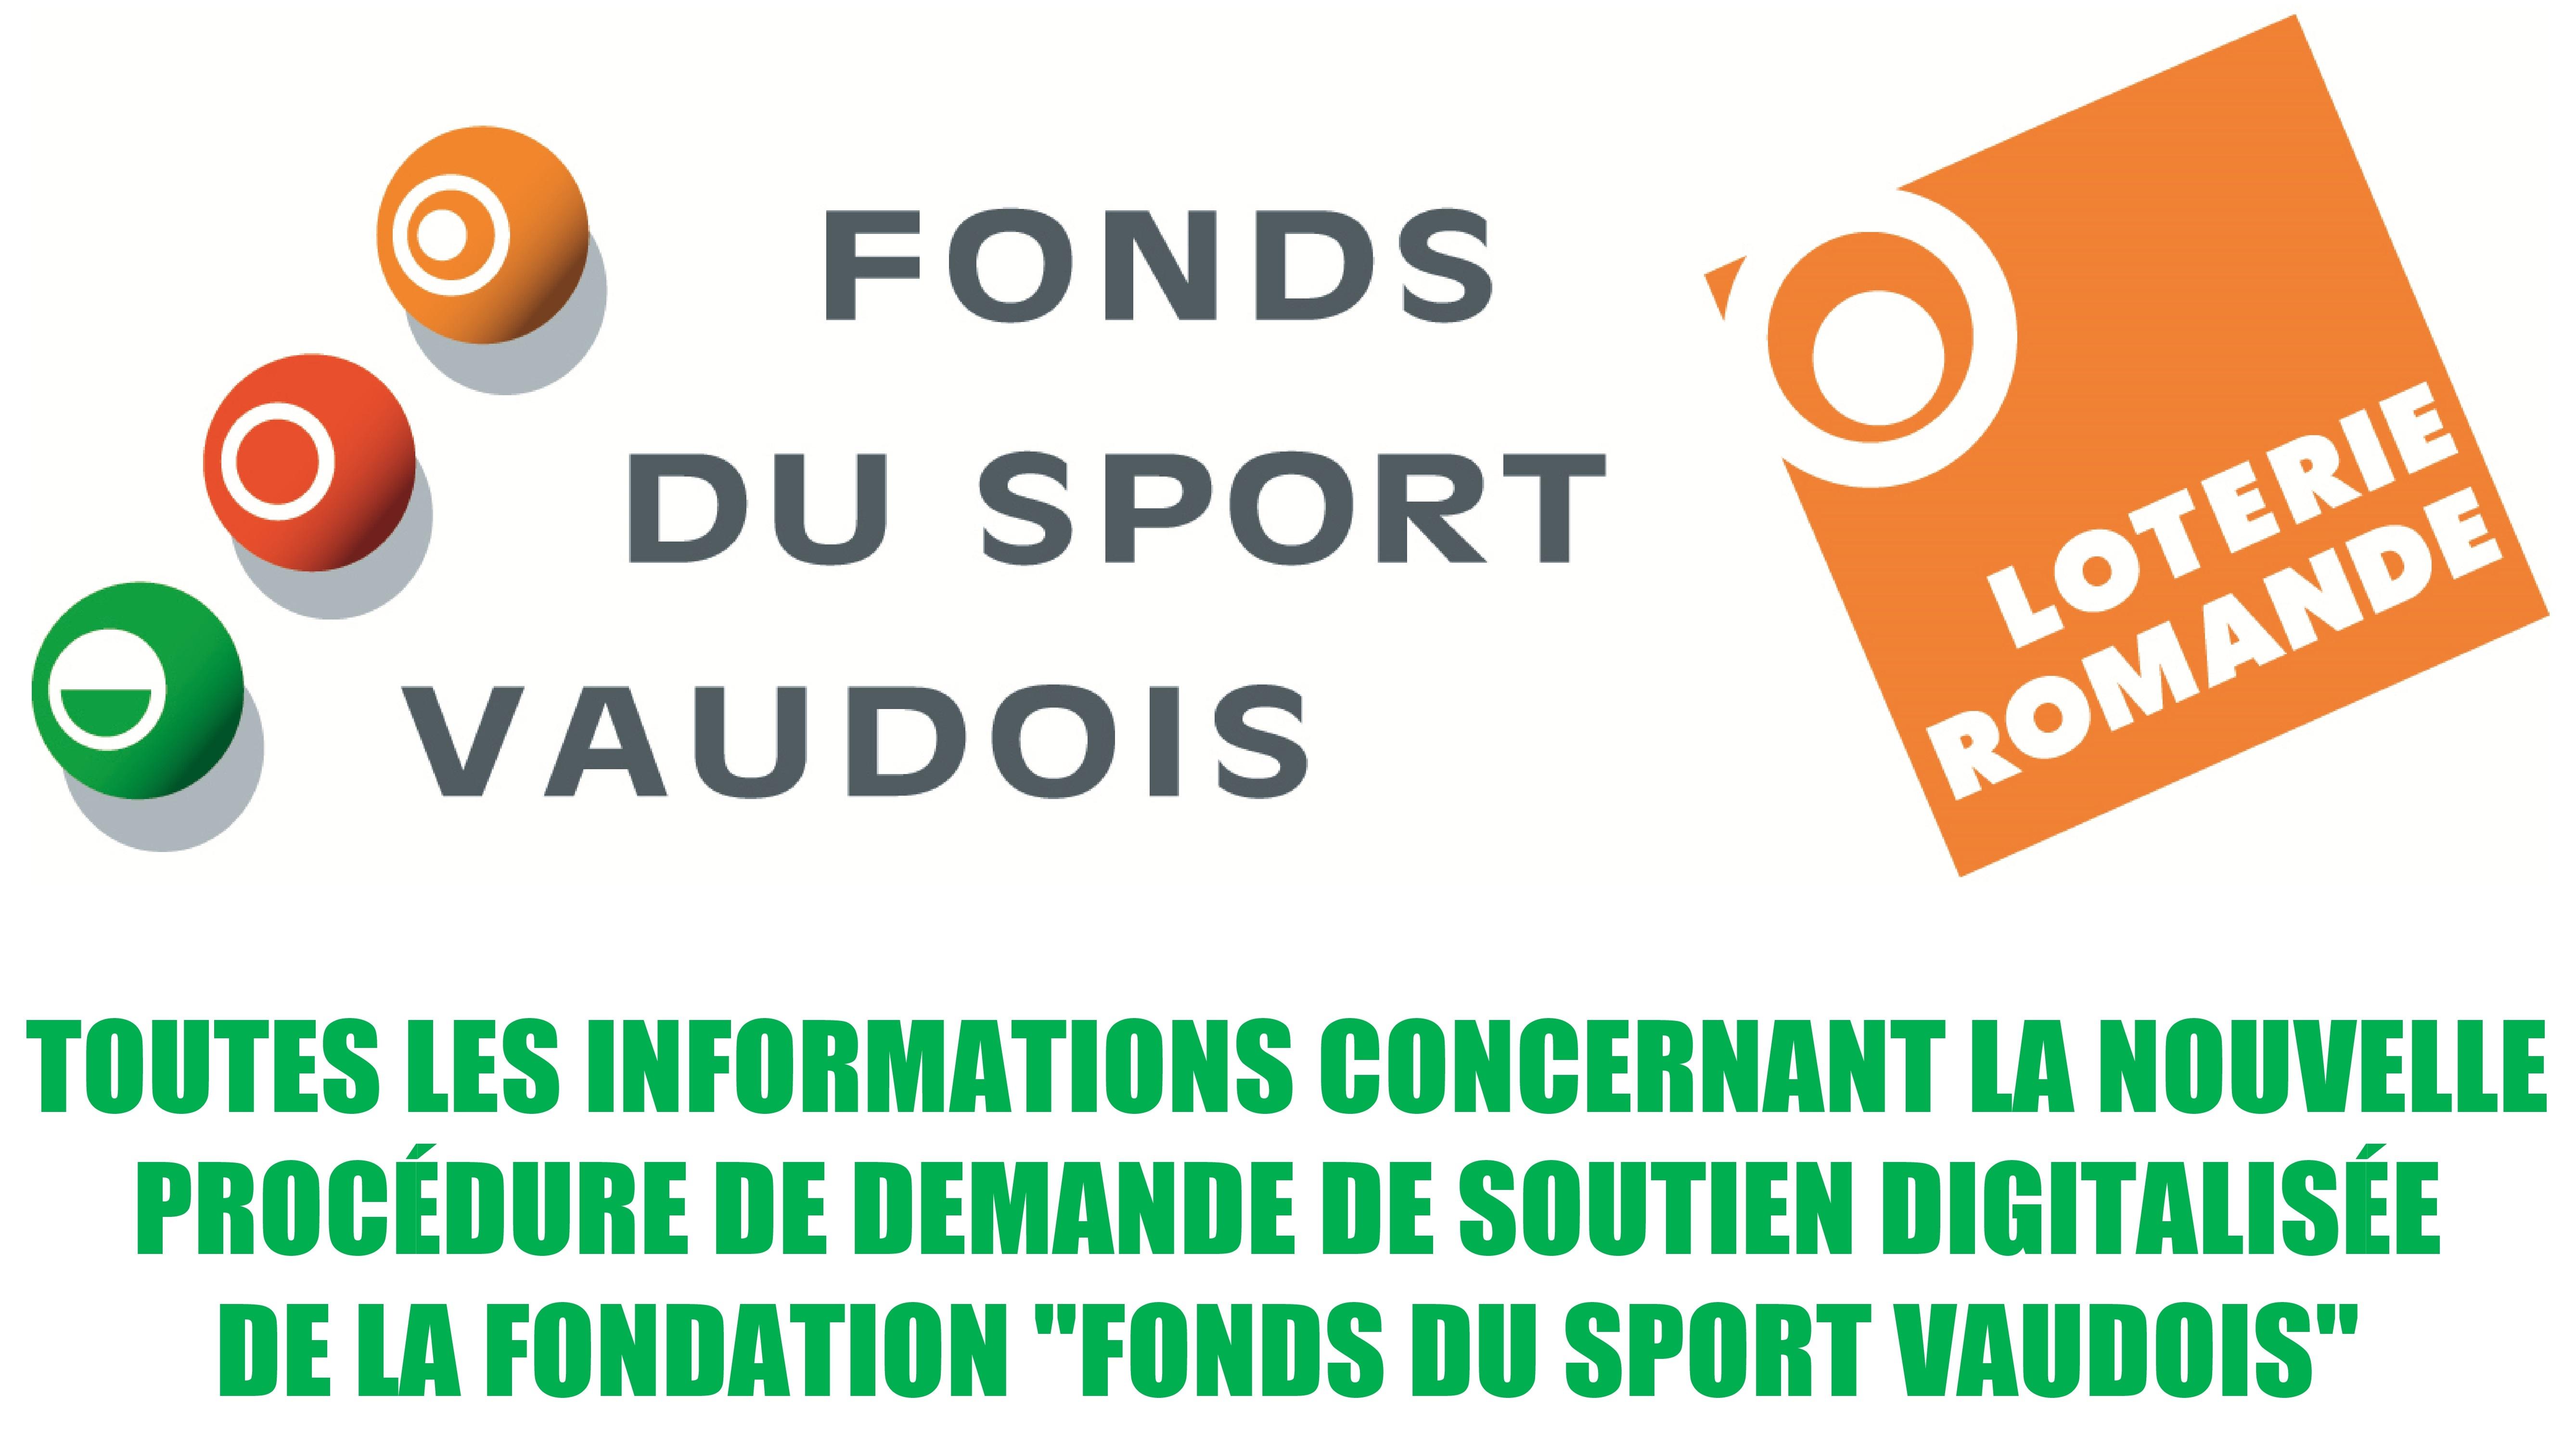 Informations du Fonds du sport vaudois